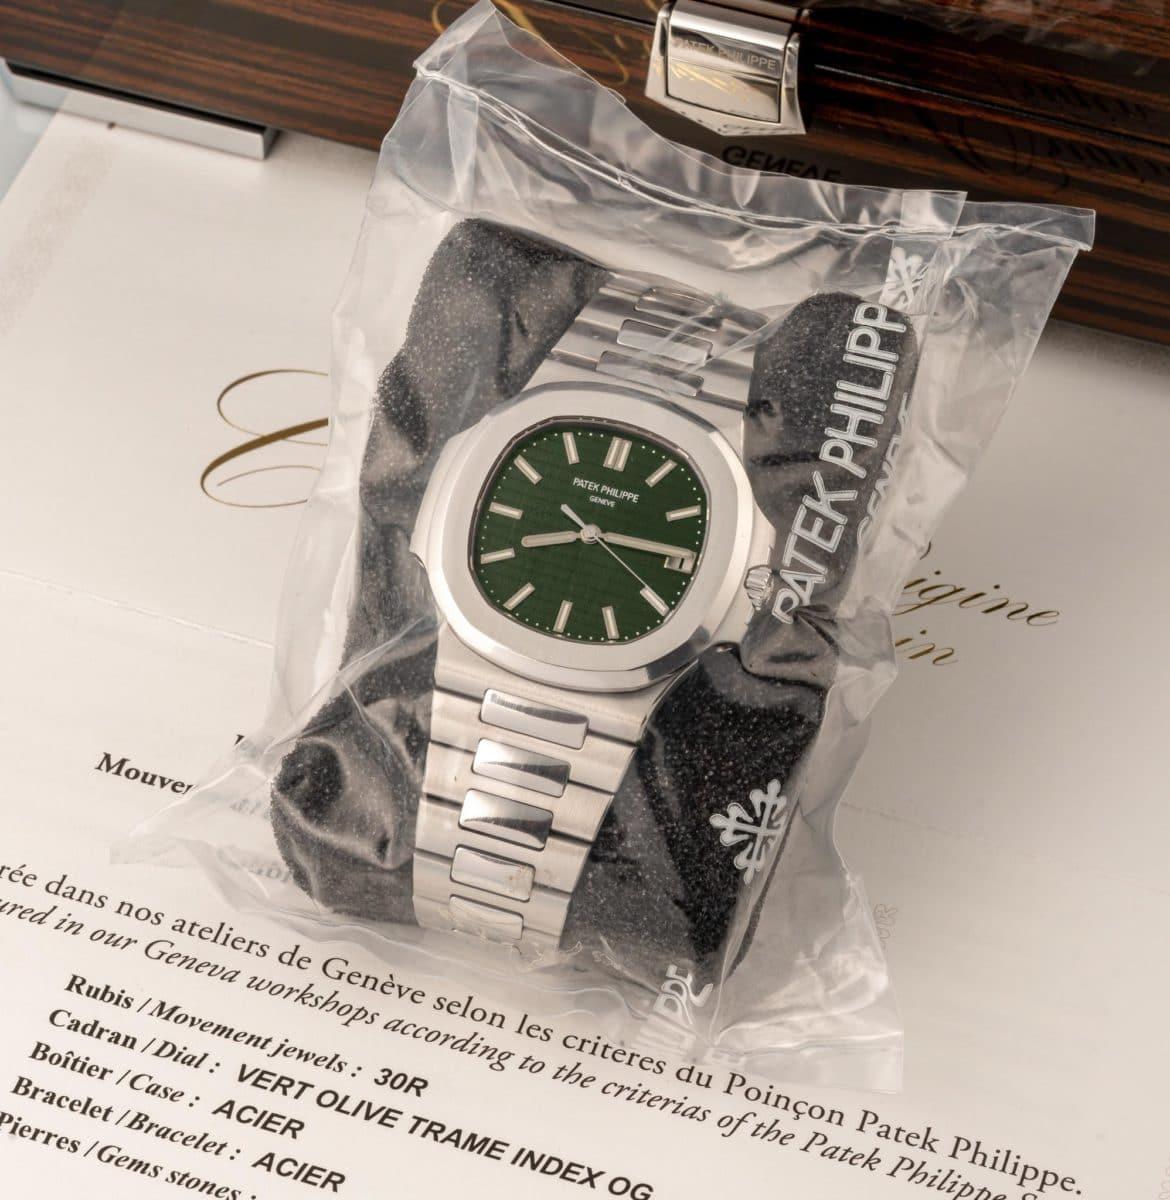 Patek Philippe 5711 auction